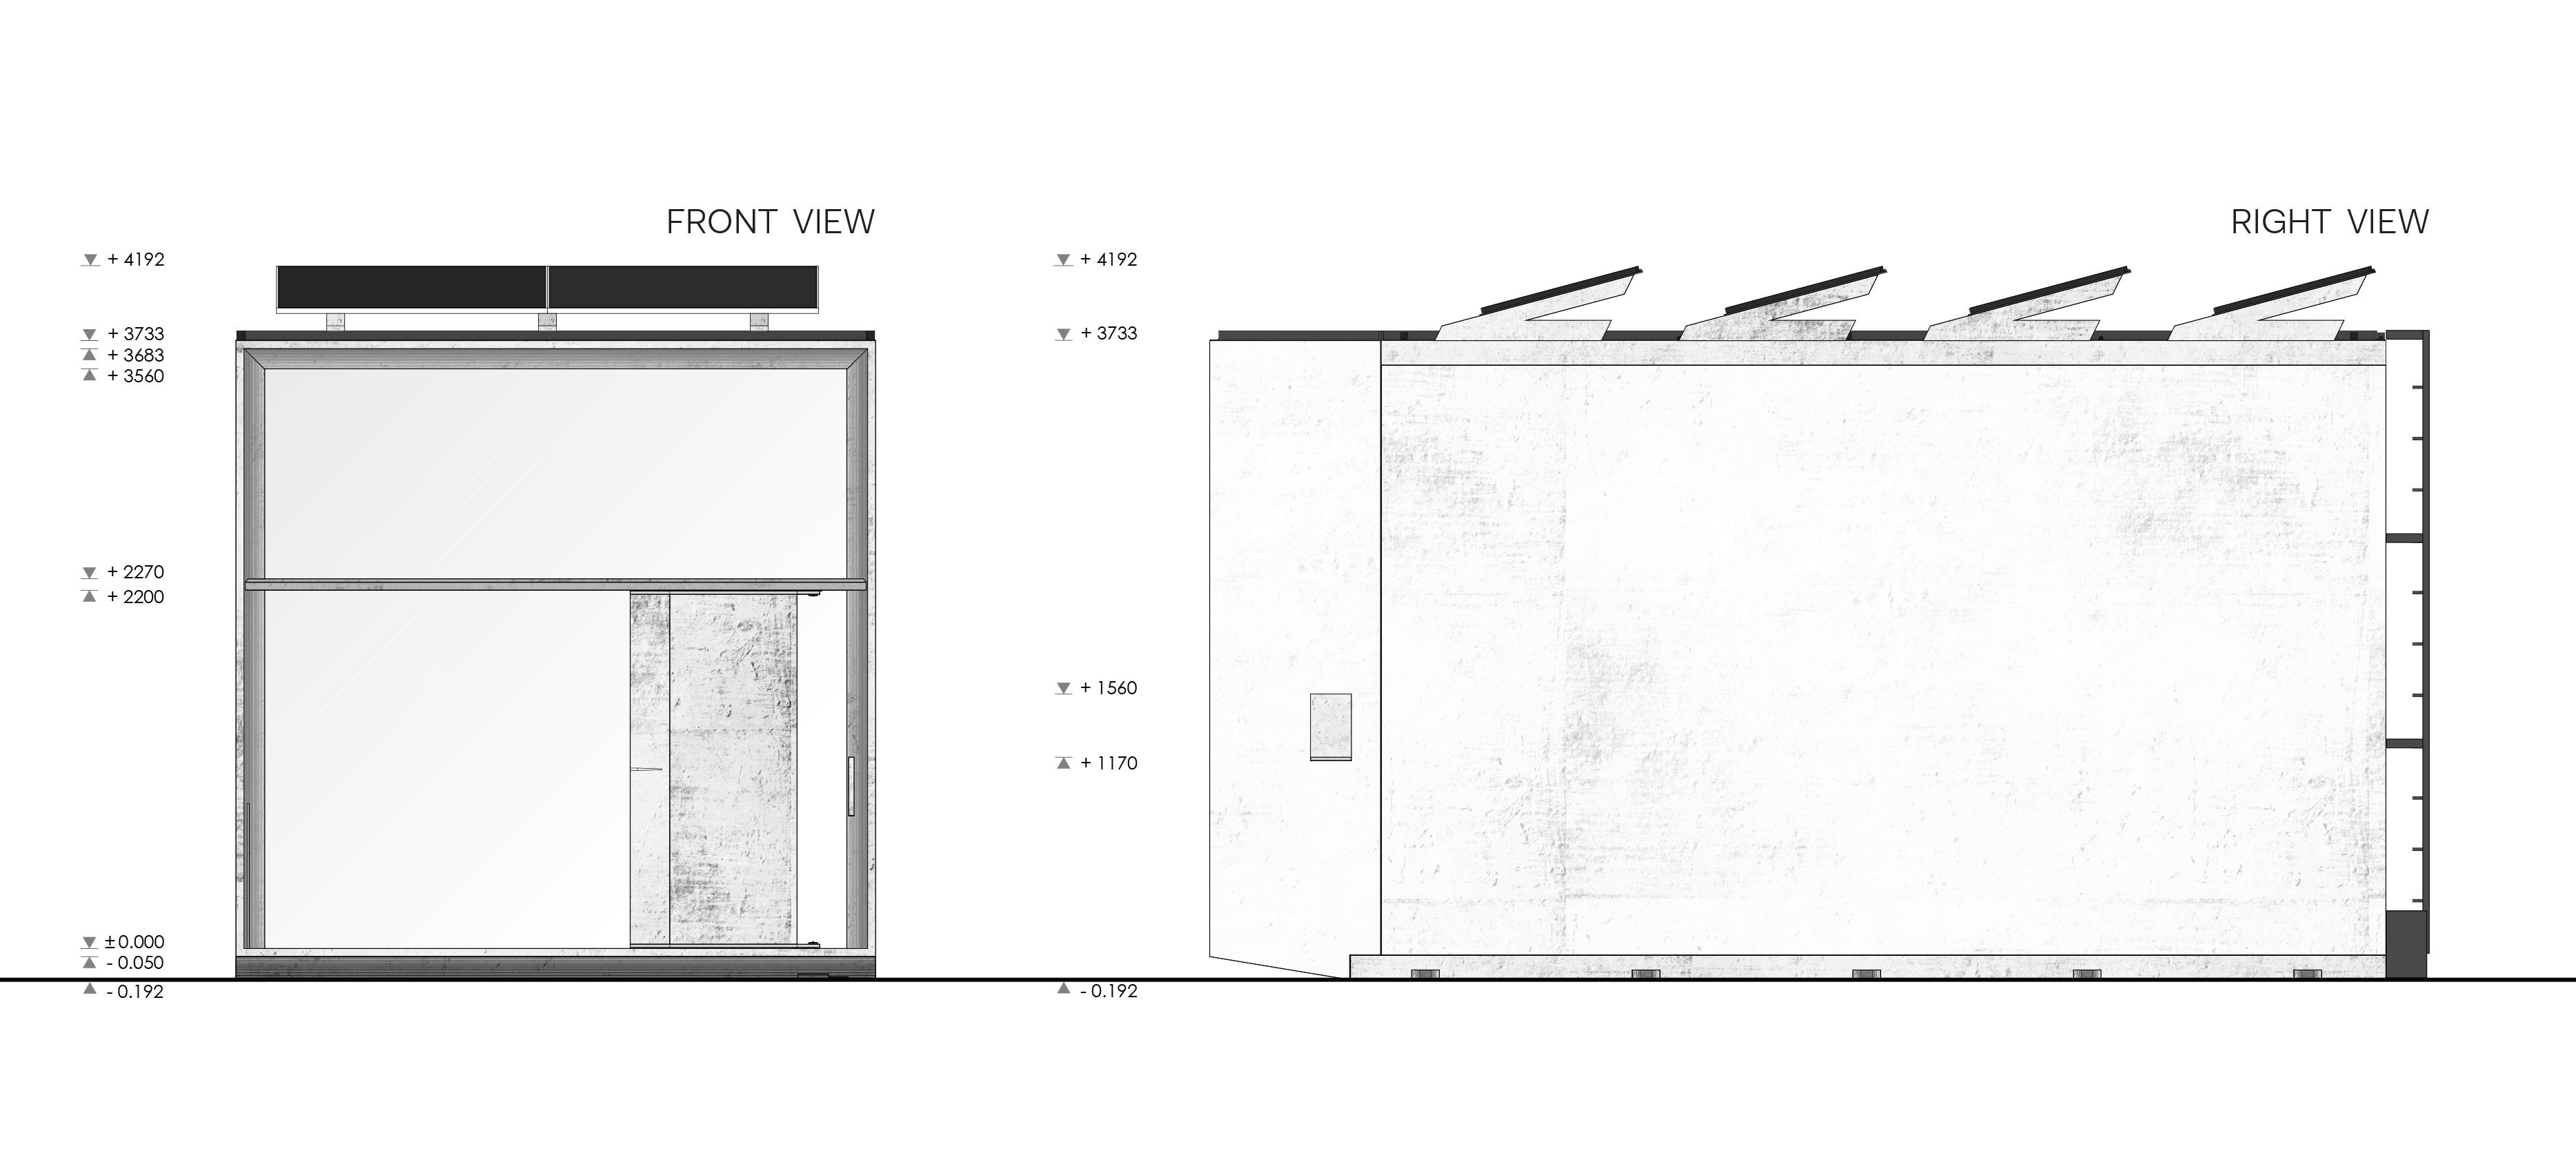 Koda The Prefabricated Mini House Prototype By Kodasema